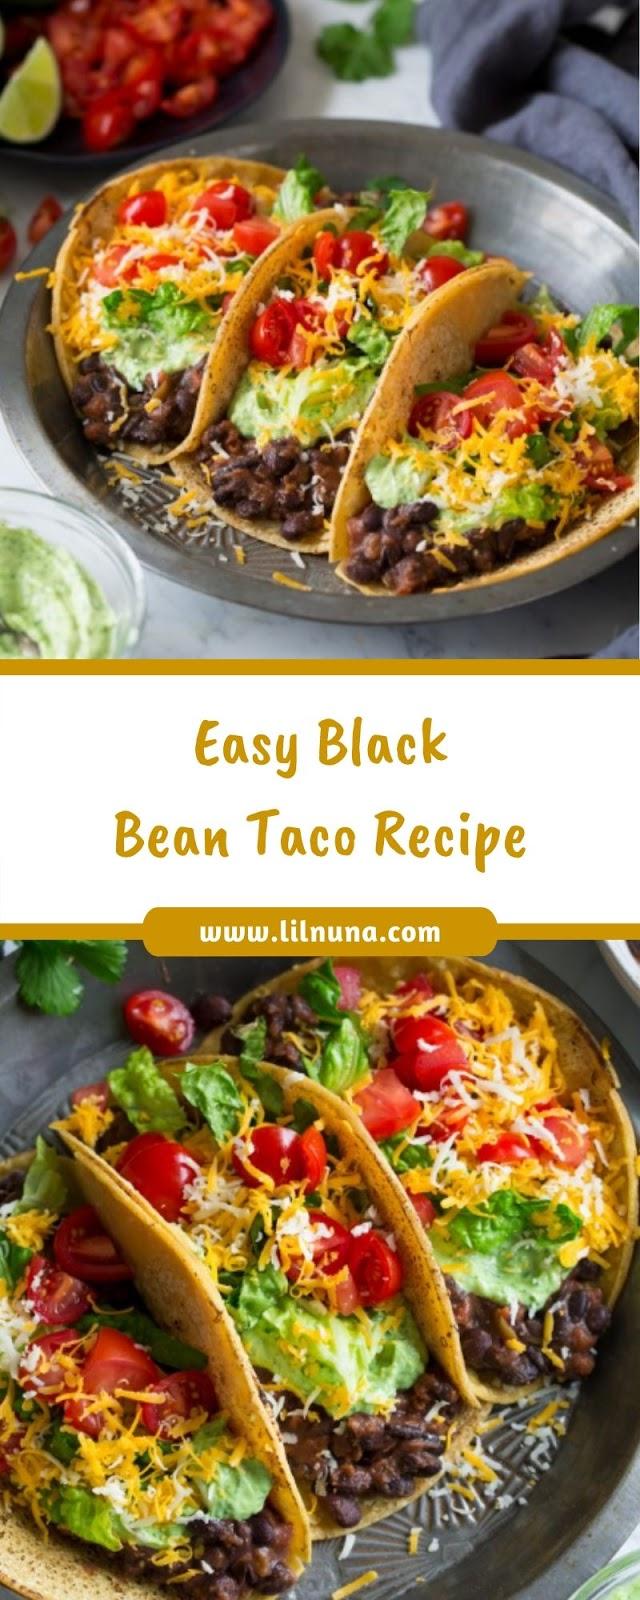 Easy Black Bean Taco Recipe